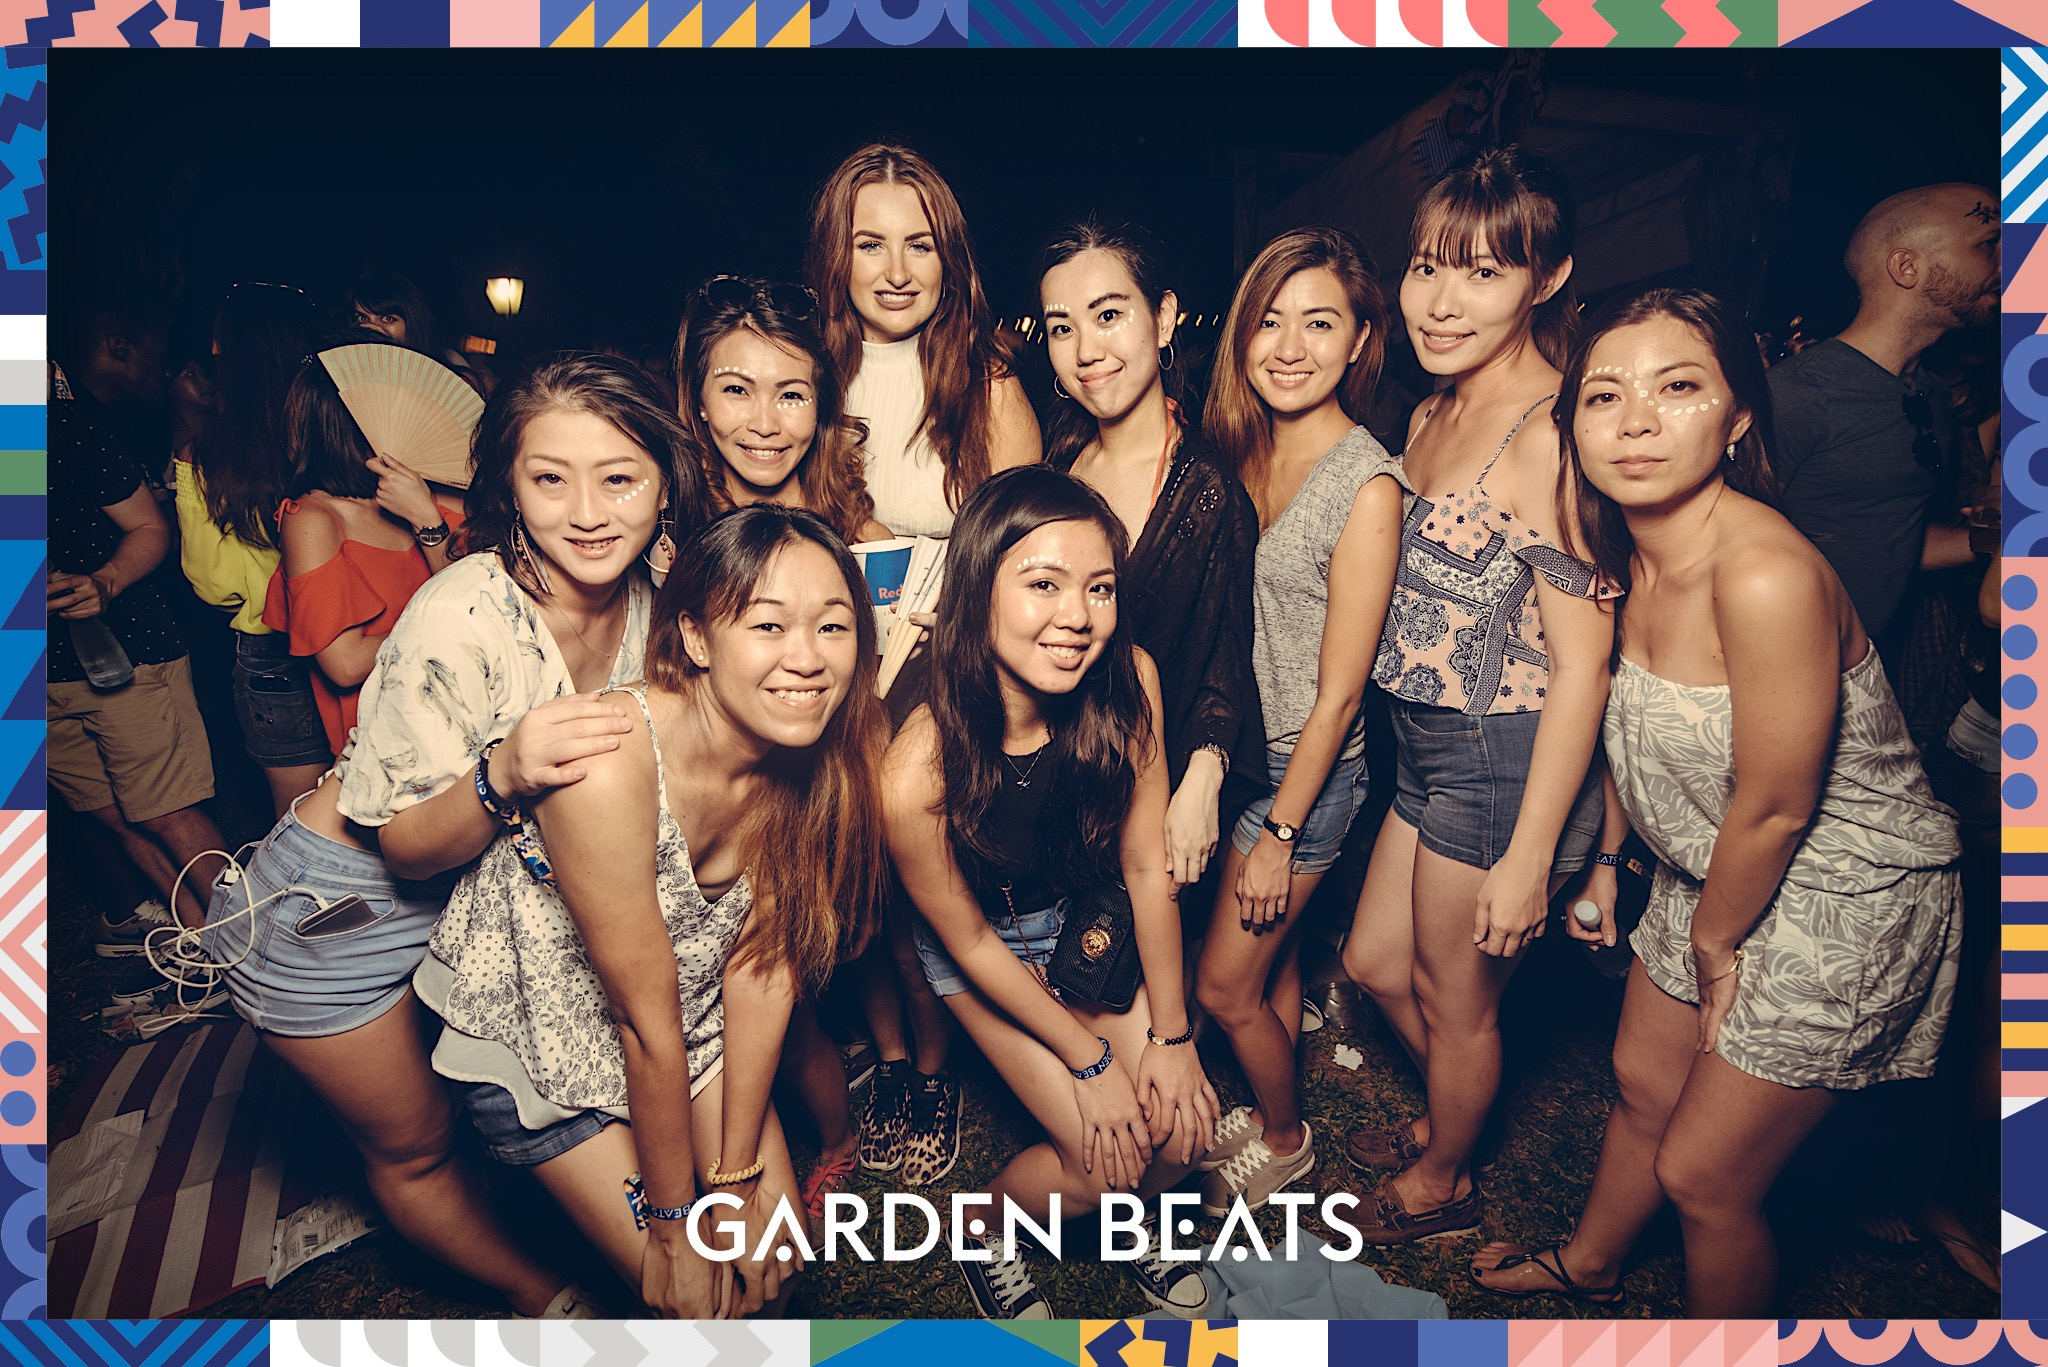 18032017_GardenBeats_Colossal812_WatermarkedGB.jpg